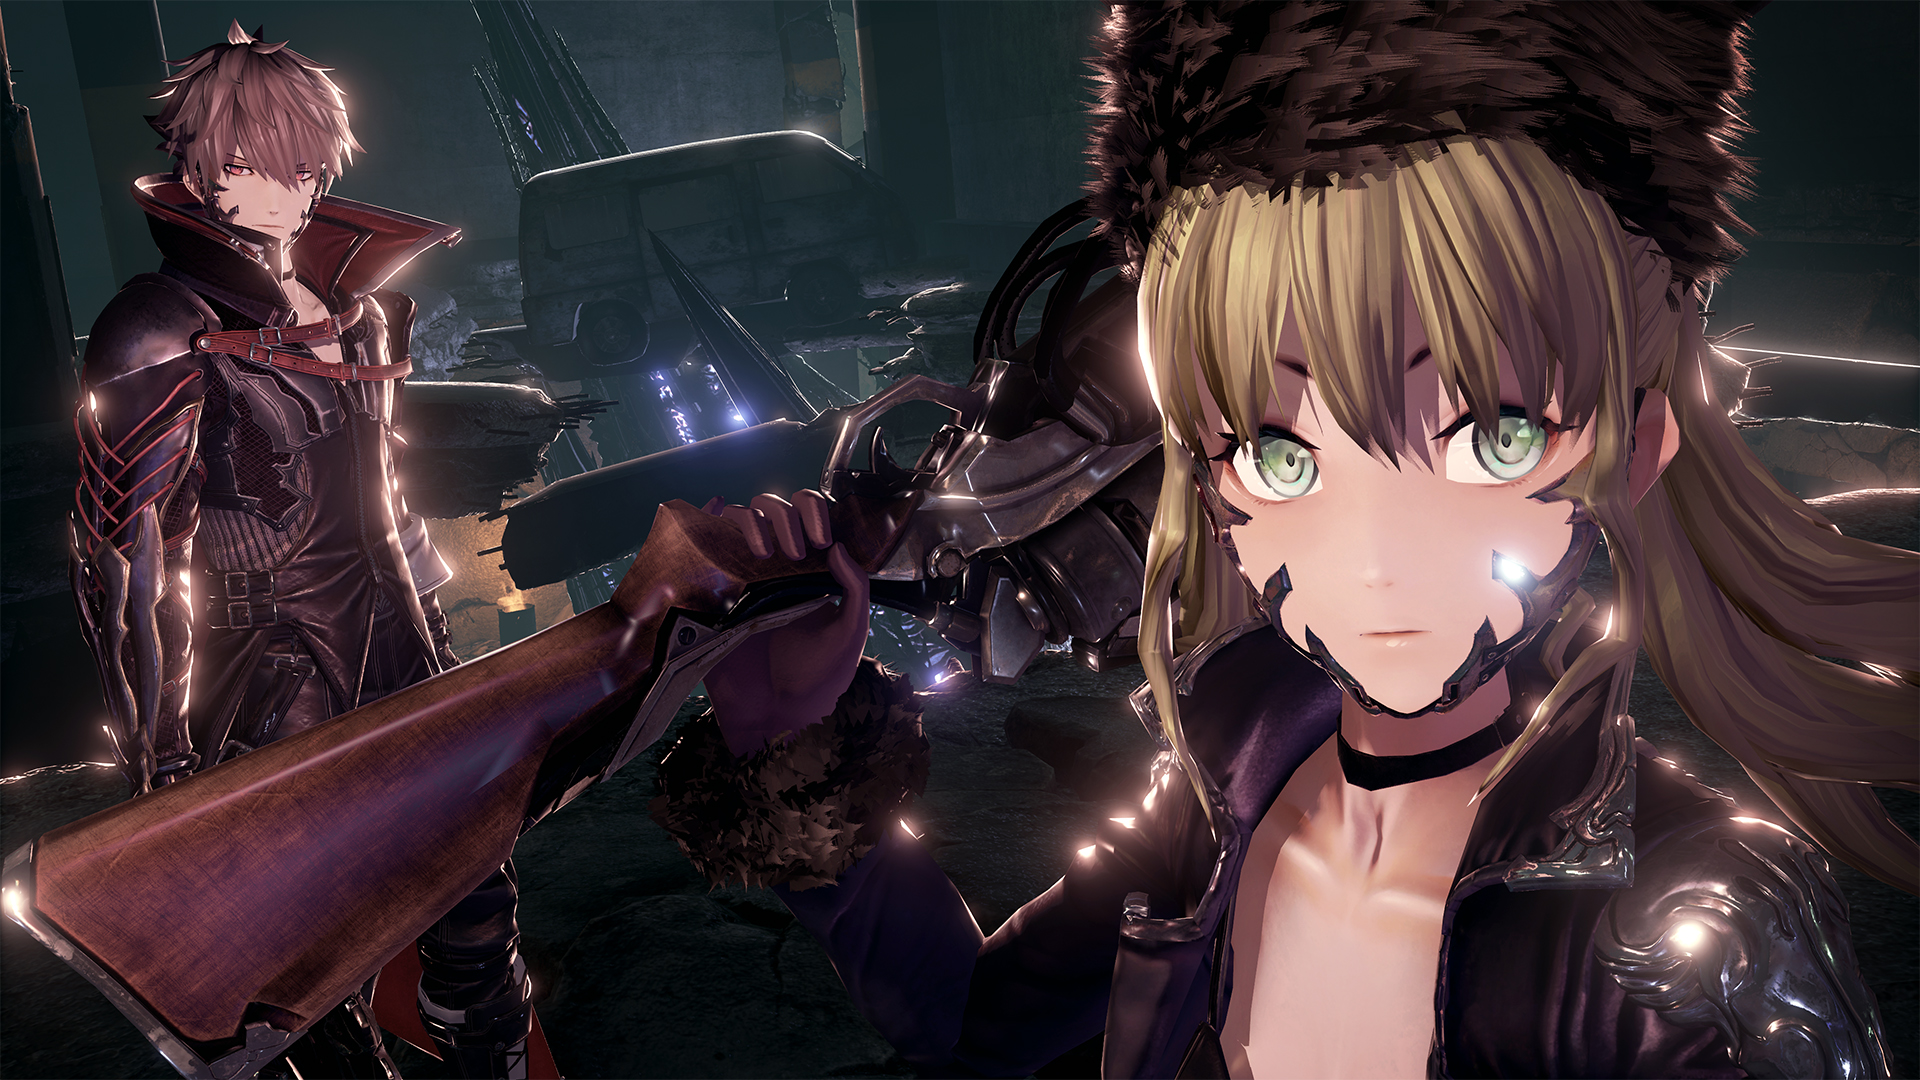 Code Vein Aka Anime Dark Souls Has Been Confirmed For Pc Pc Gamer